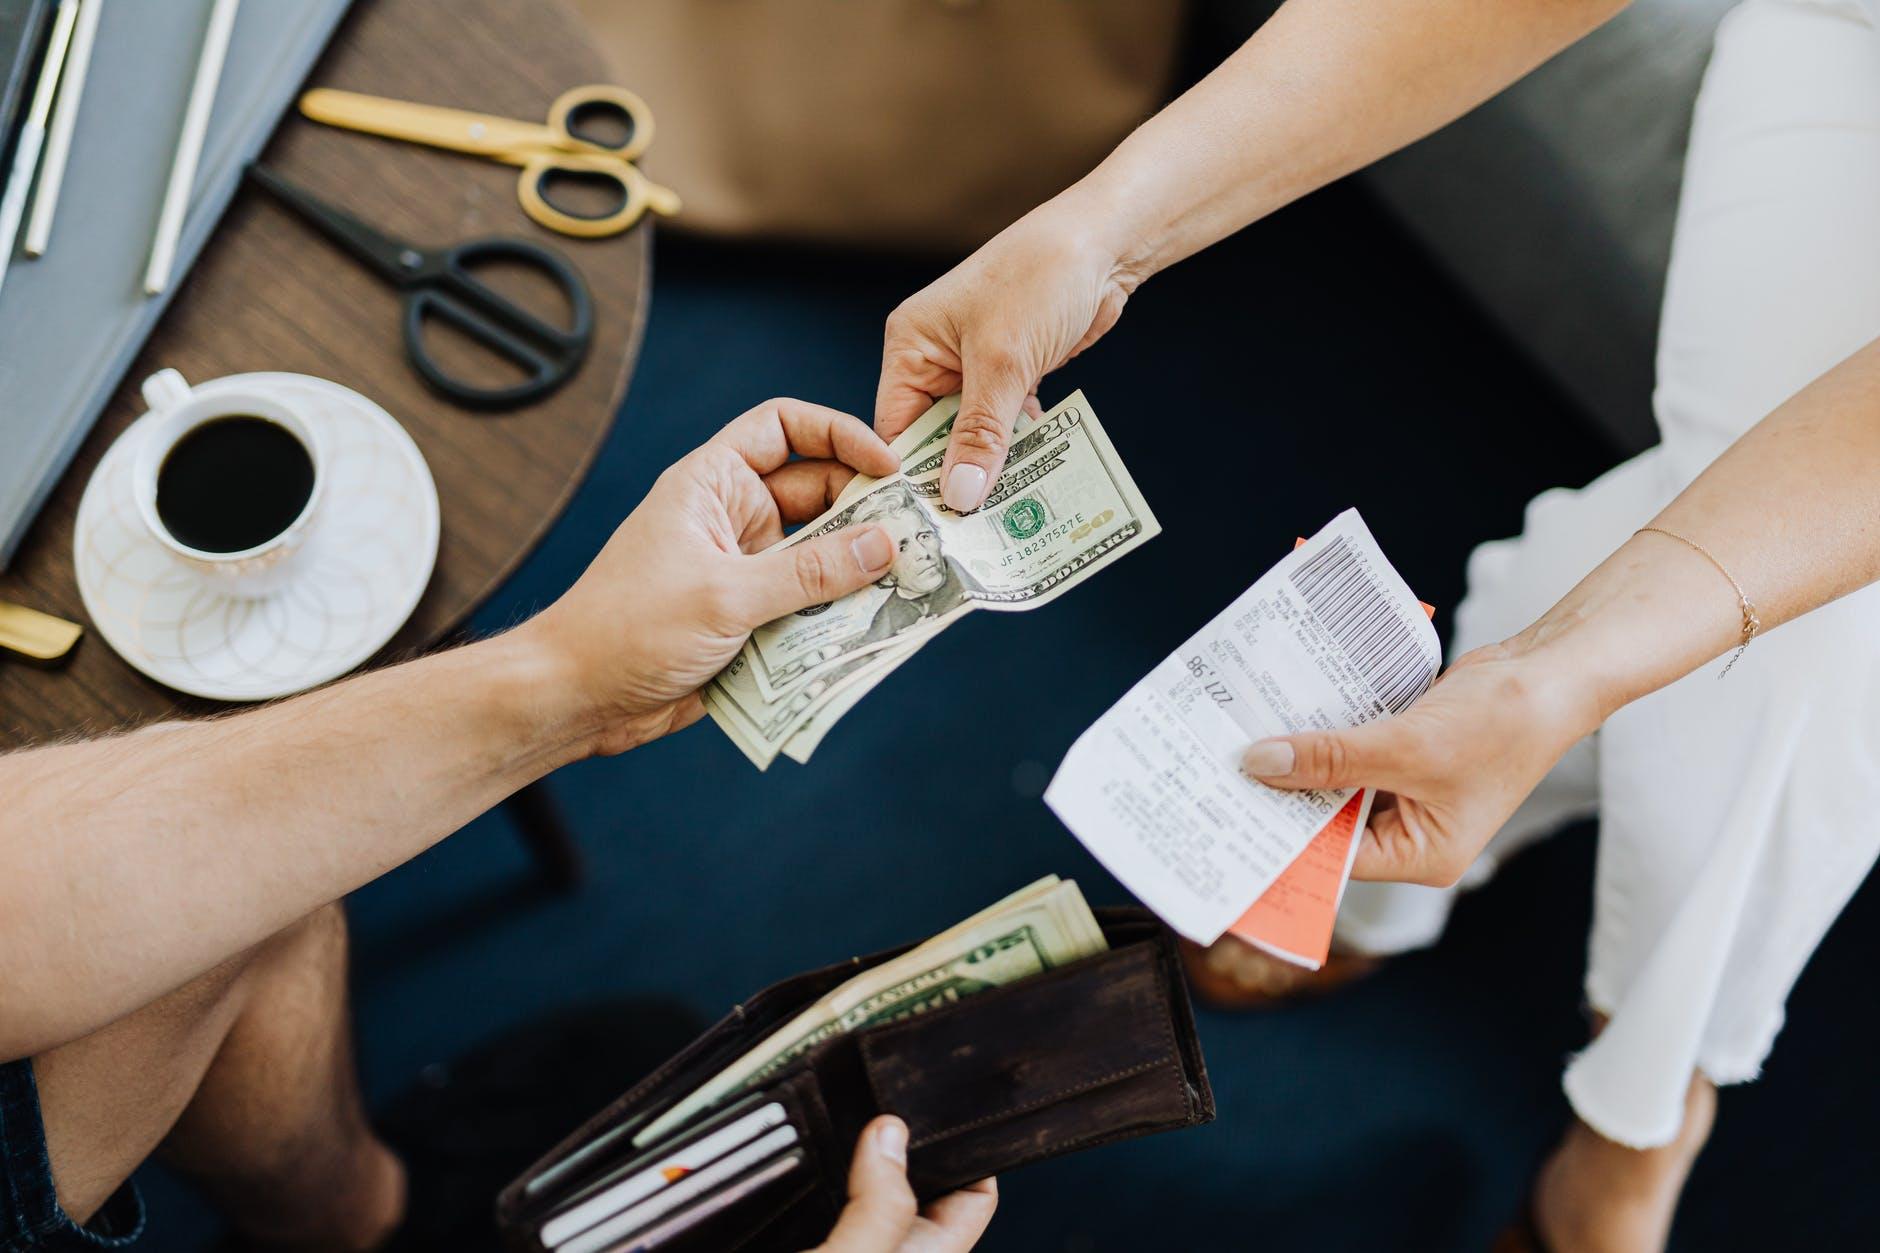 Employee Reimbursement Under the FLSA